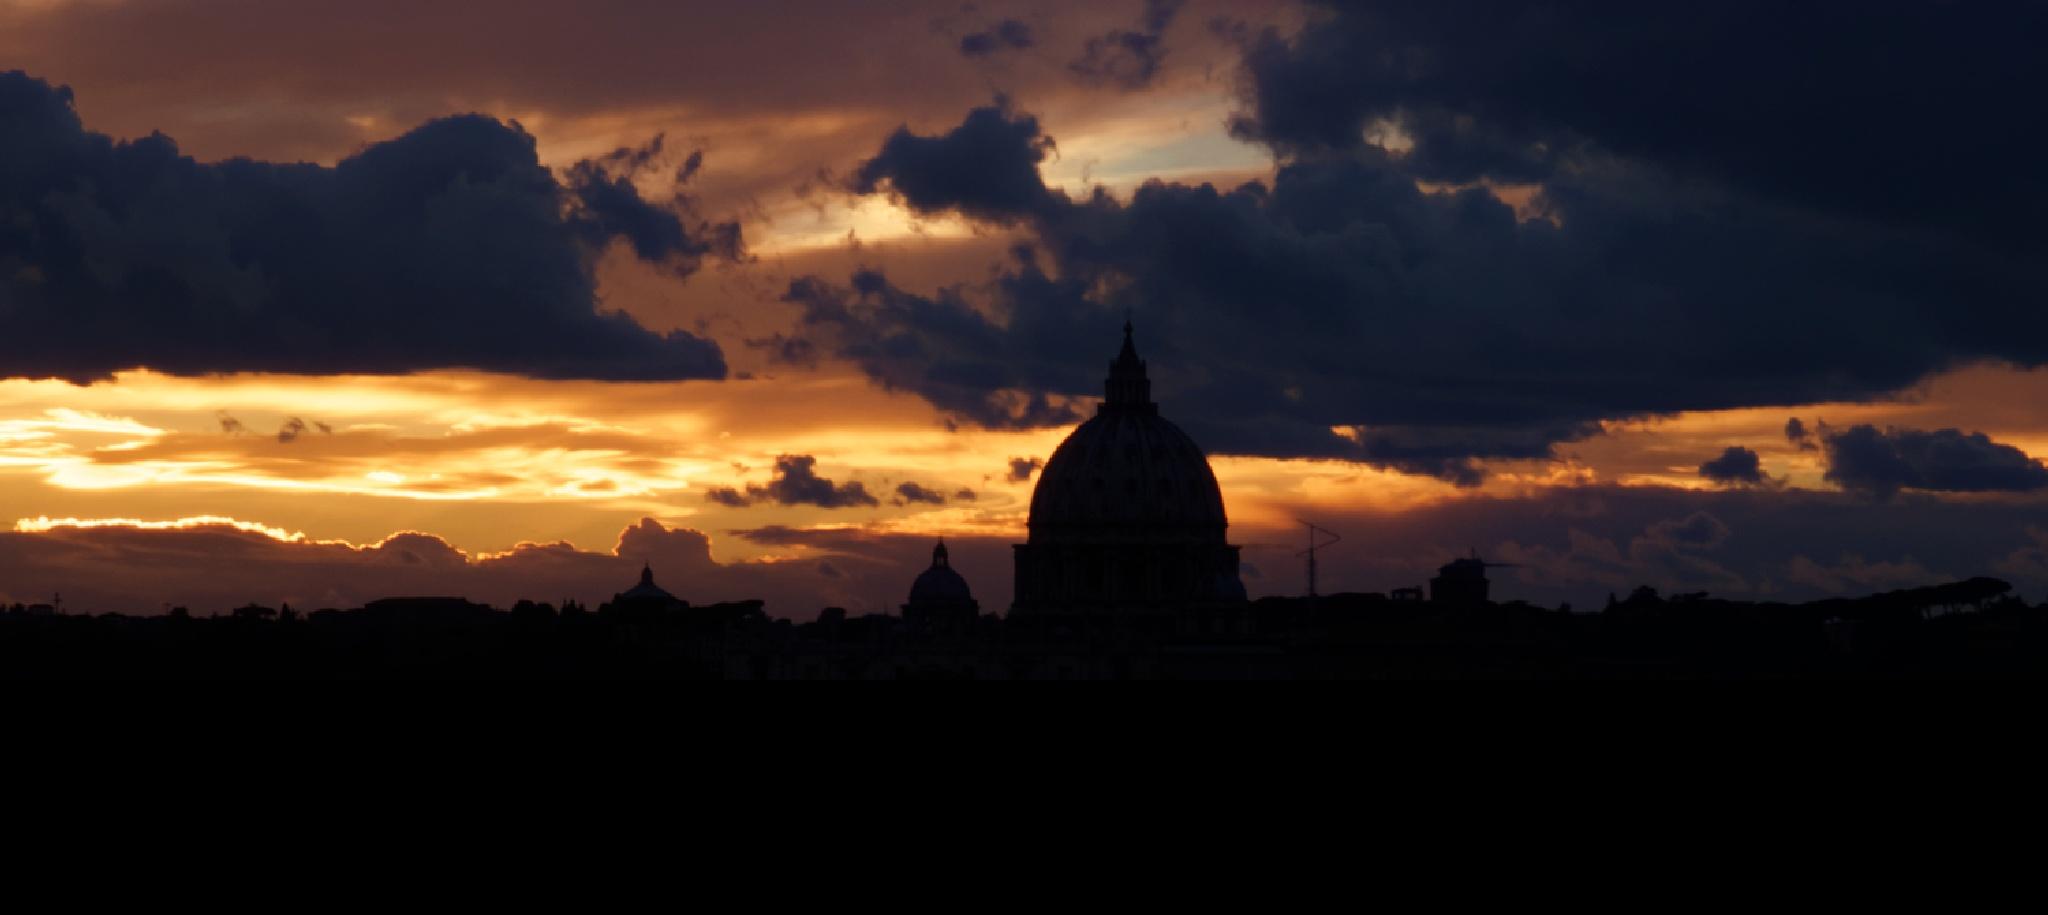 Rome sunset silhouette by Roberto Scordino